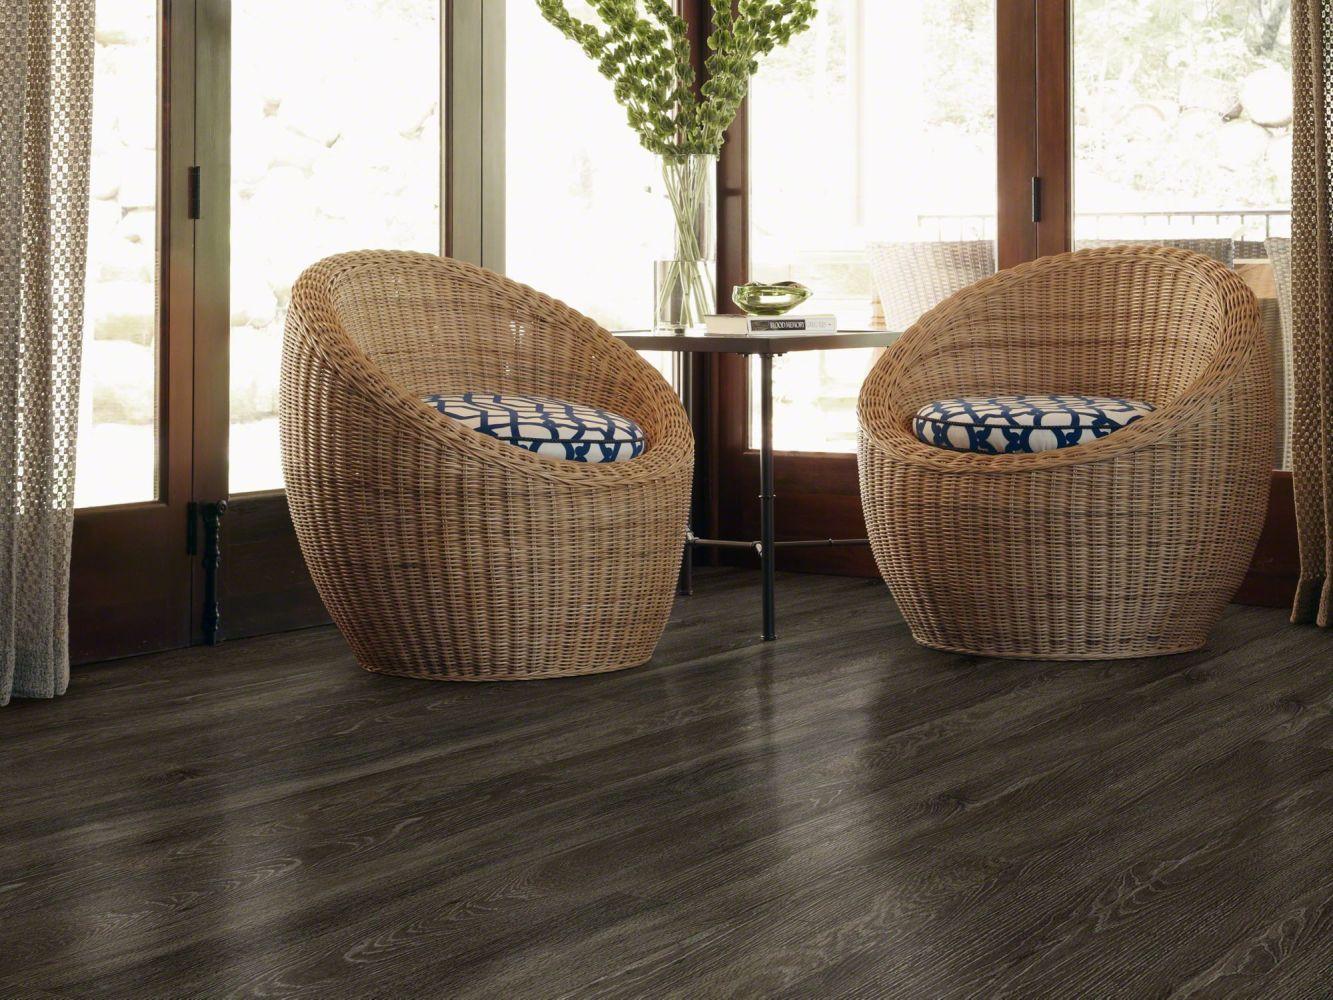 Shaw Floors Resilient Residential Legacy Plus Mila 00753_0458V